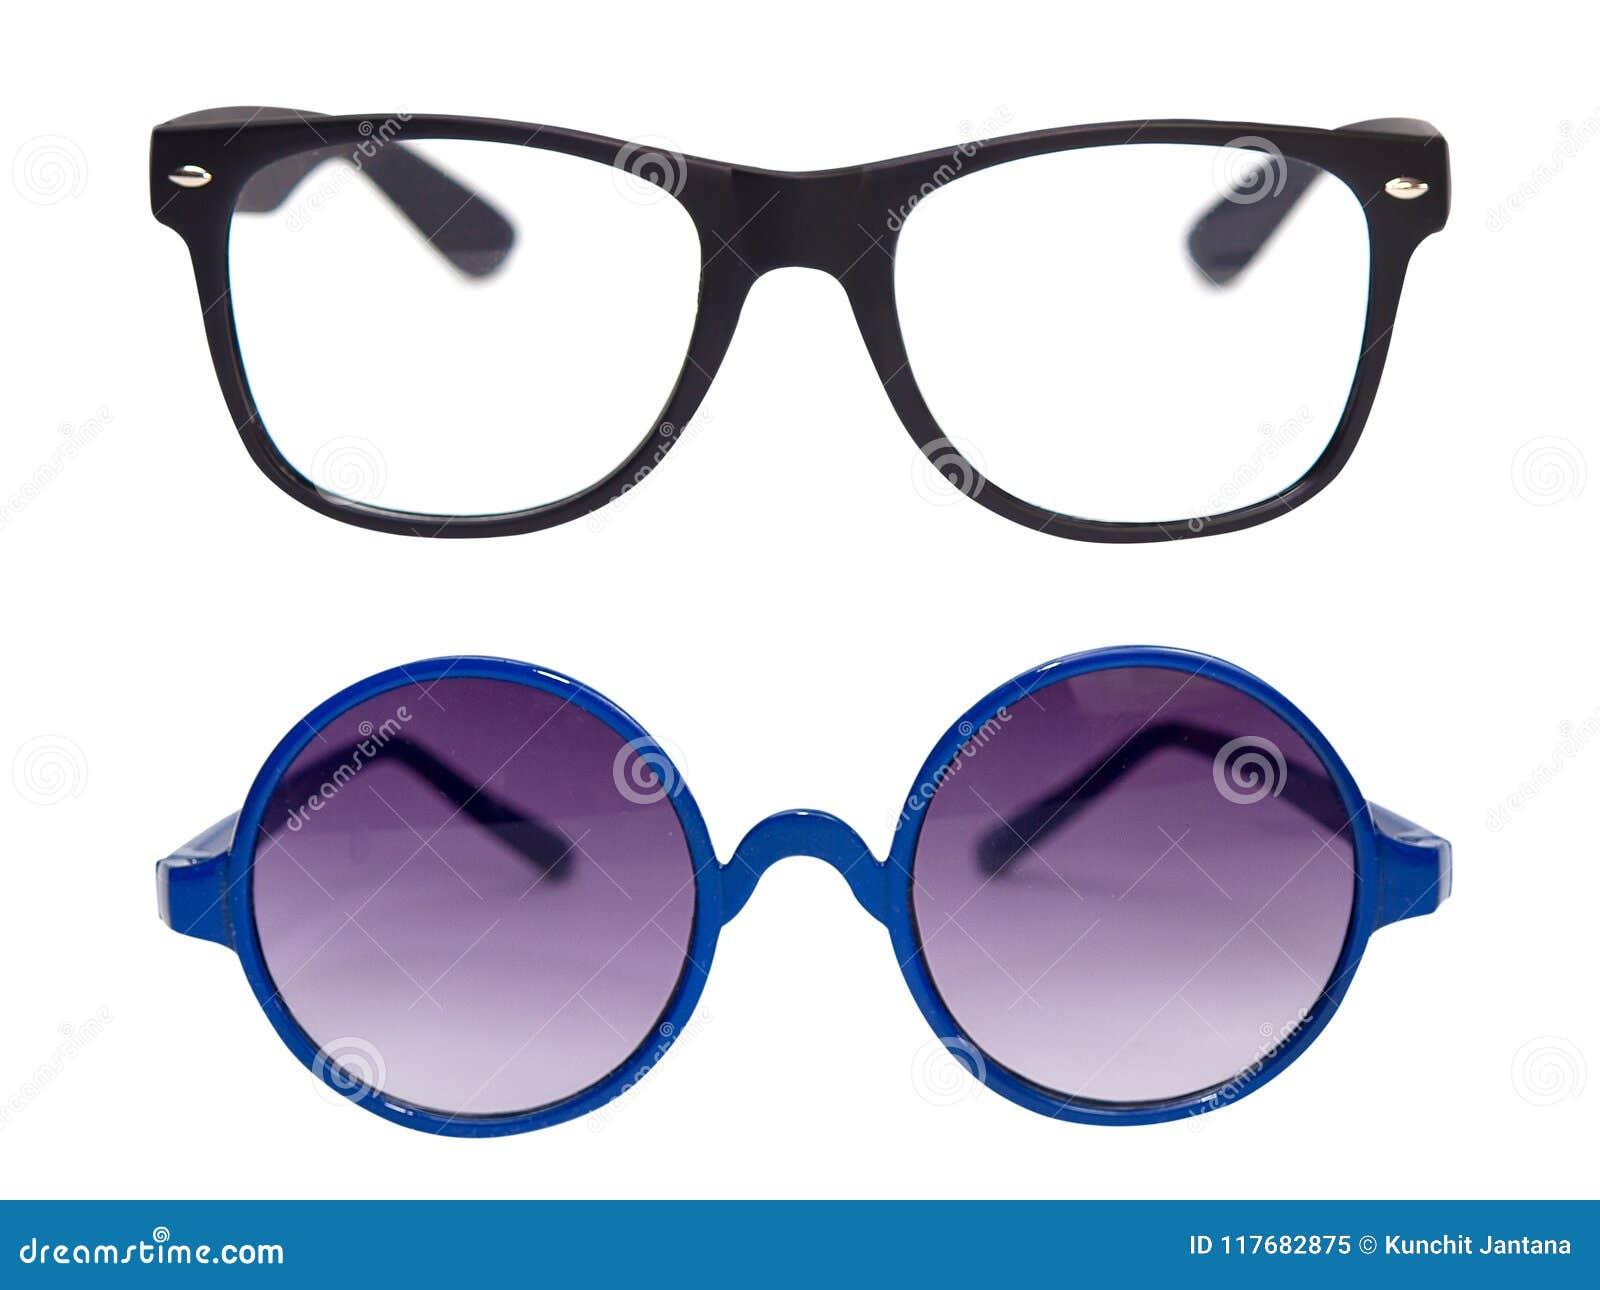 design of eyeglasses frames stock image image of view specs